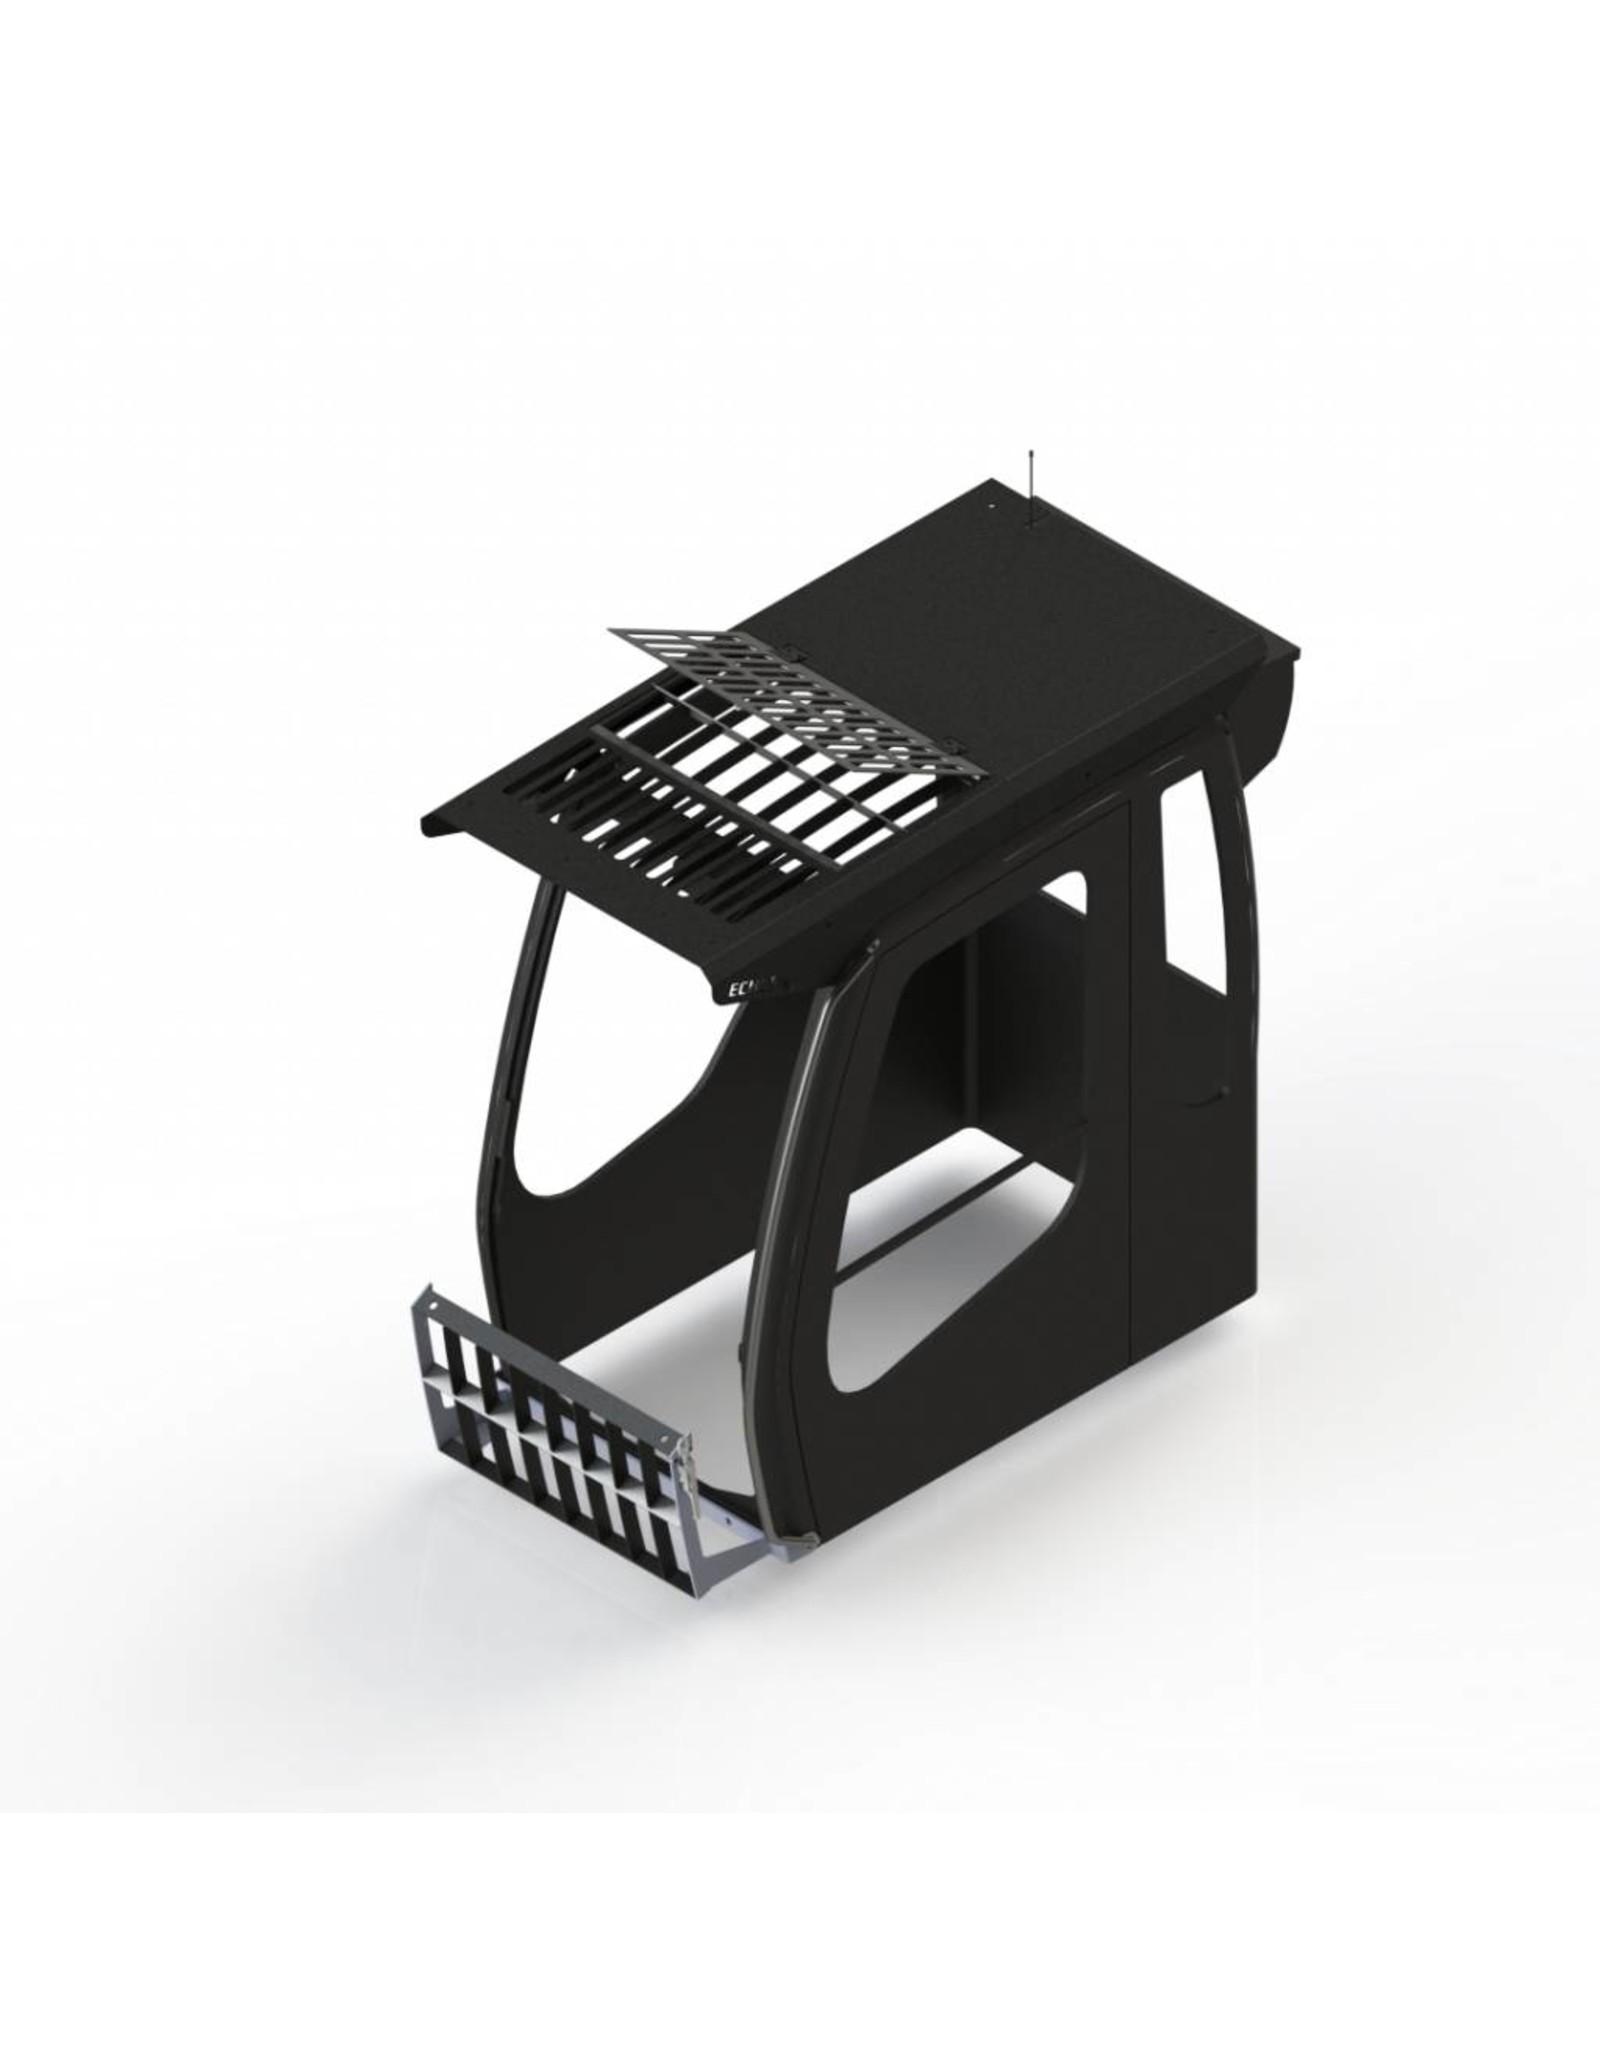 Echle Hartstahl GmbH FOPS für JCB JS220 X LC